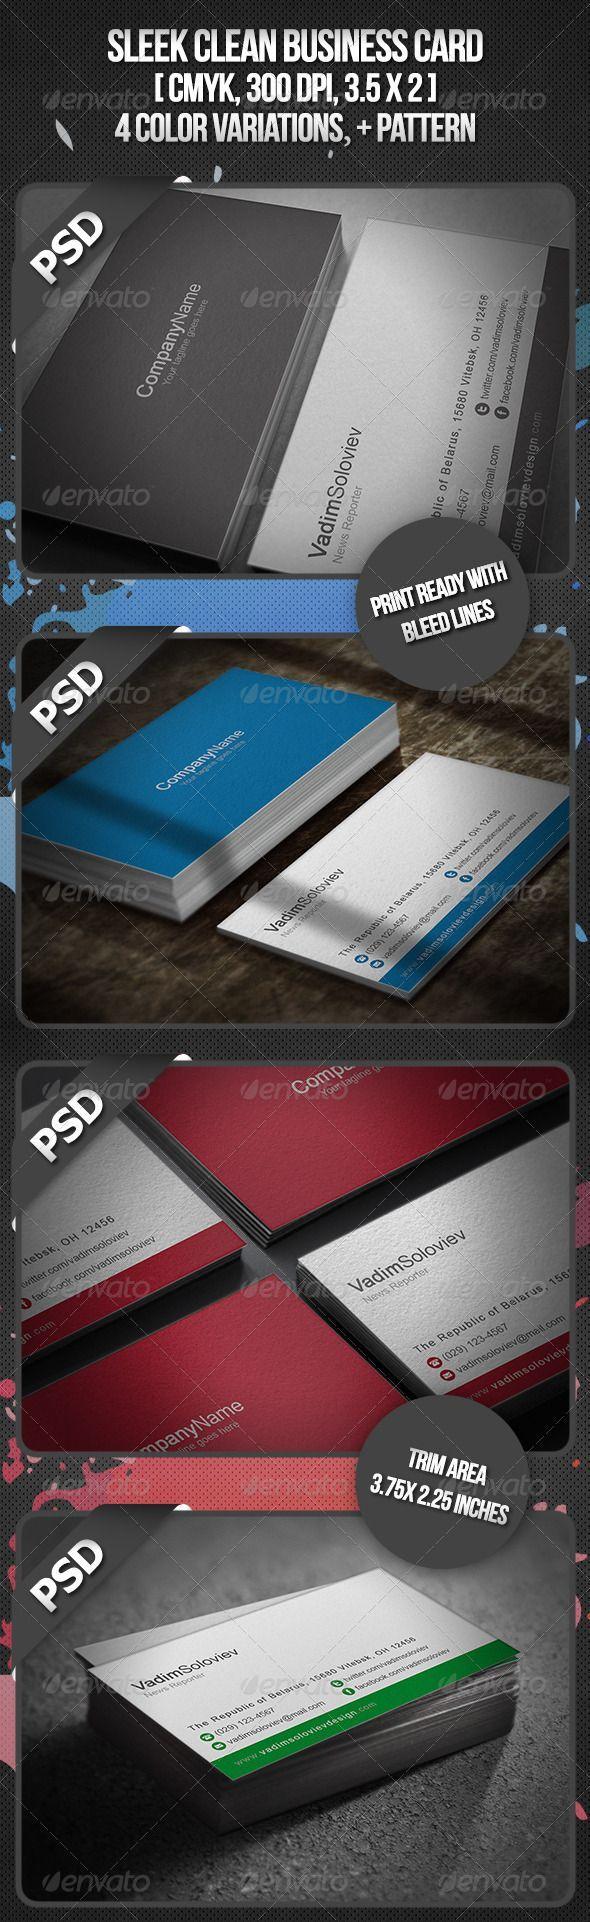 2864 best business card images on pinterest fonts and blue brown sleek business card magicingreecefo Images